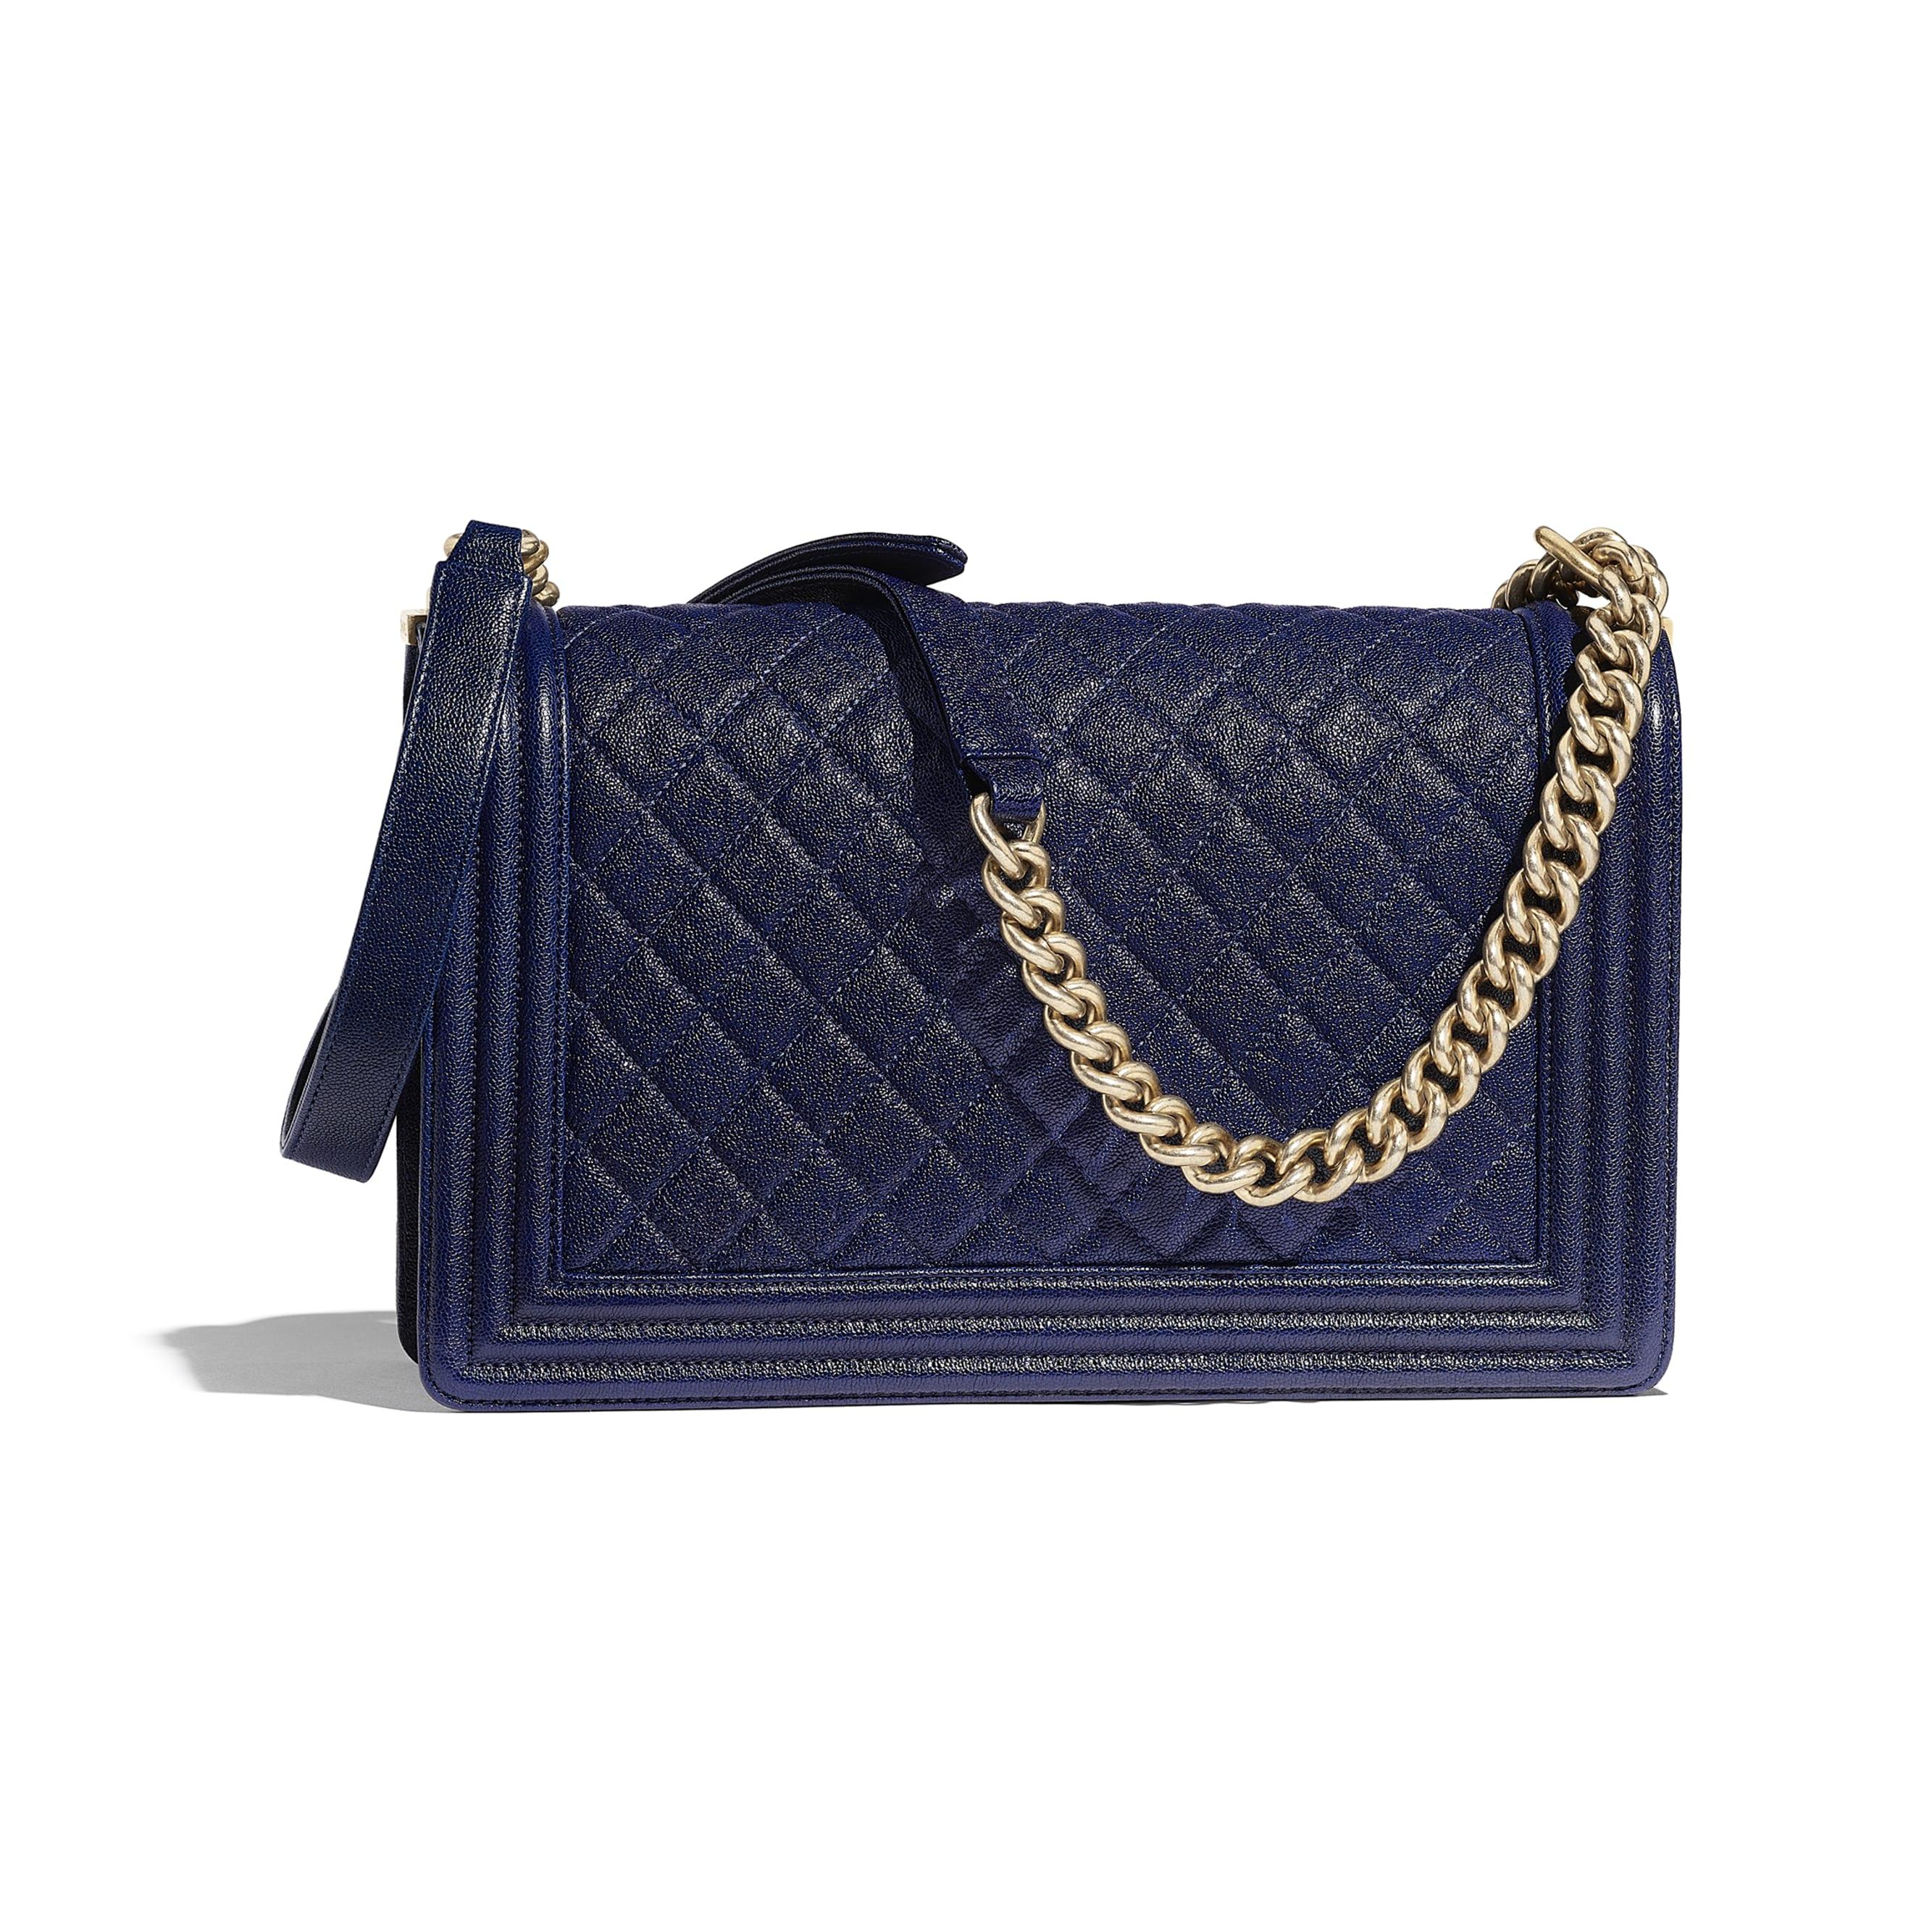 Large BOY CHANEL Handbag - Blue - Grained Calfskin & Gold-Tone Metal - Alternative view - see standard sized version